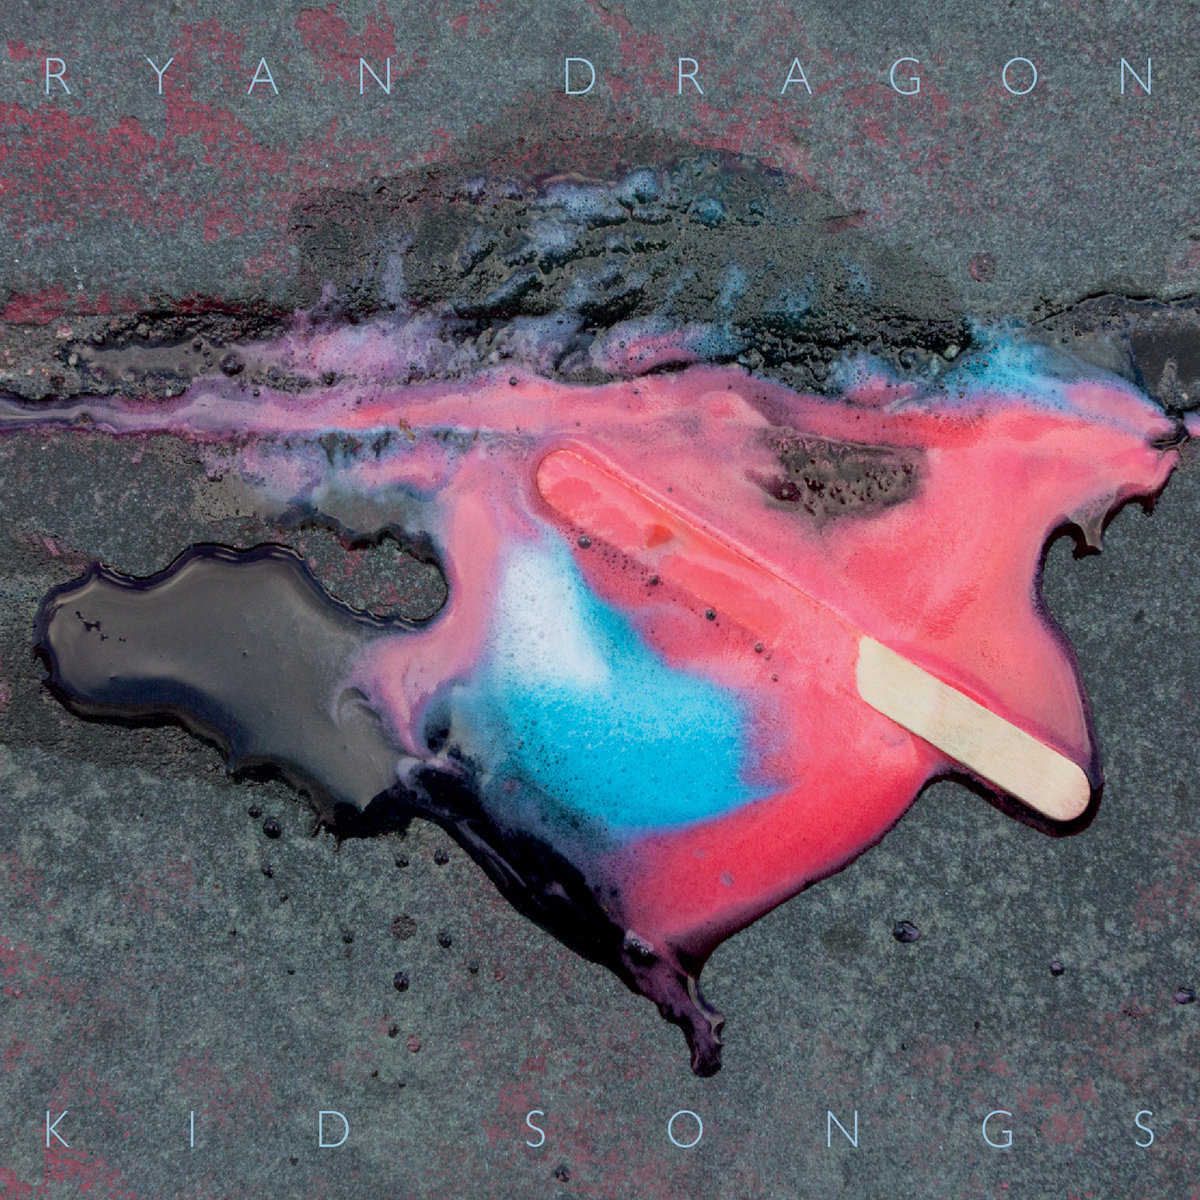 Ryan Dragon | Kid Songs